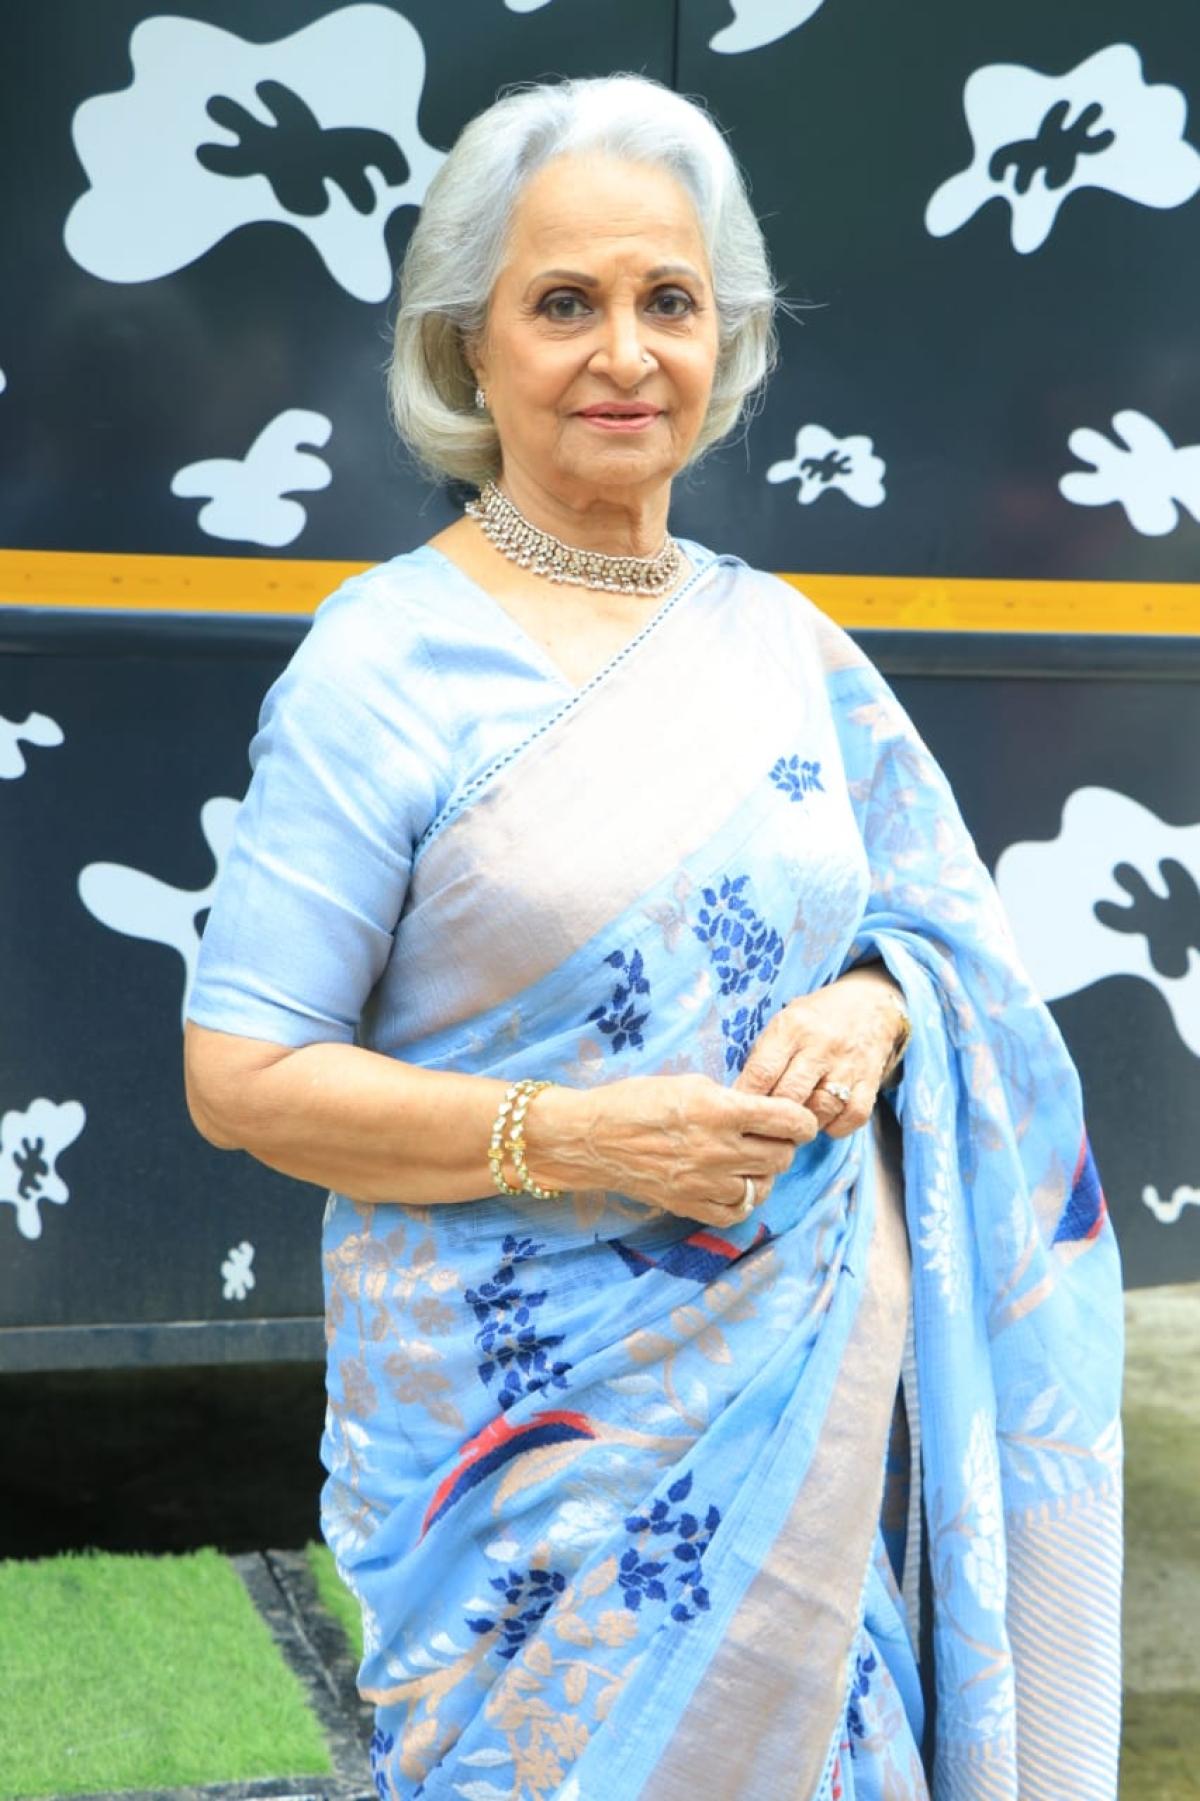 Veteran actress Waheeda Rehman was spotted wearing a elegant blue sarre on sets of Dance India Dance in Mumbai.